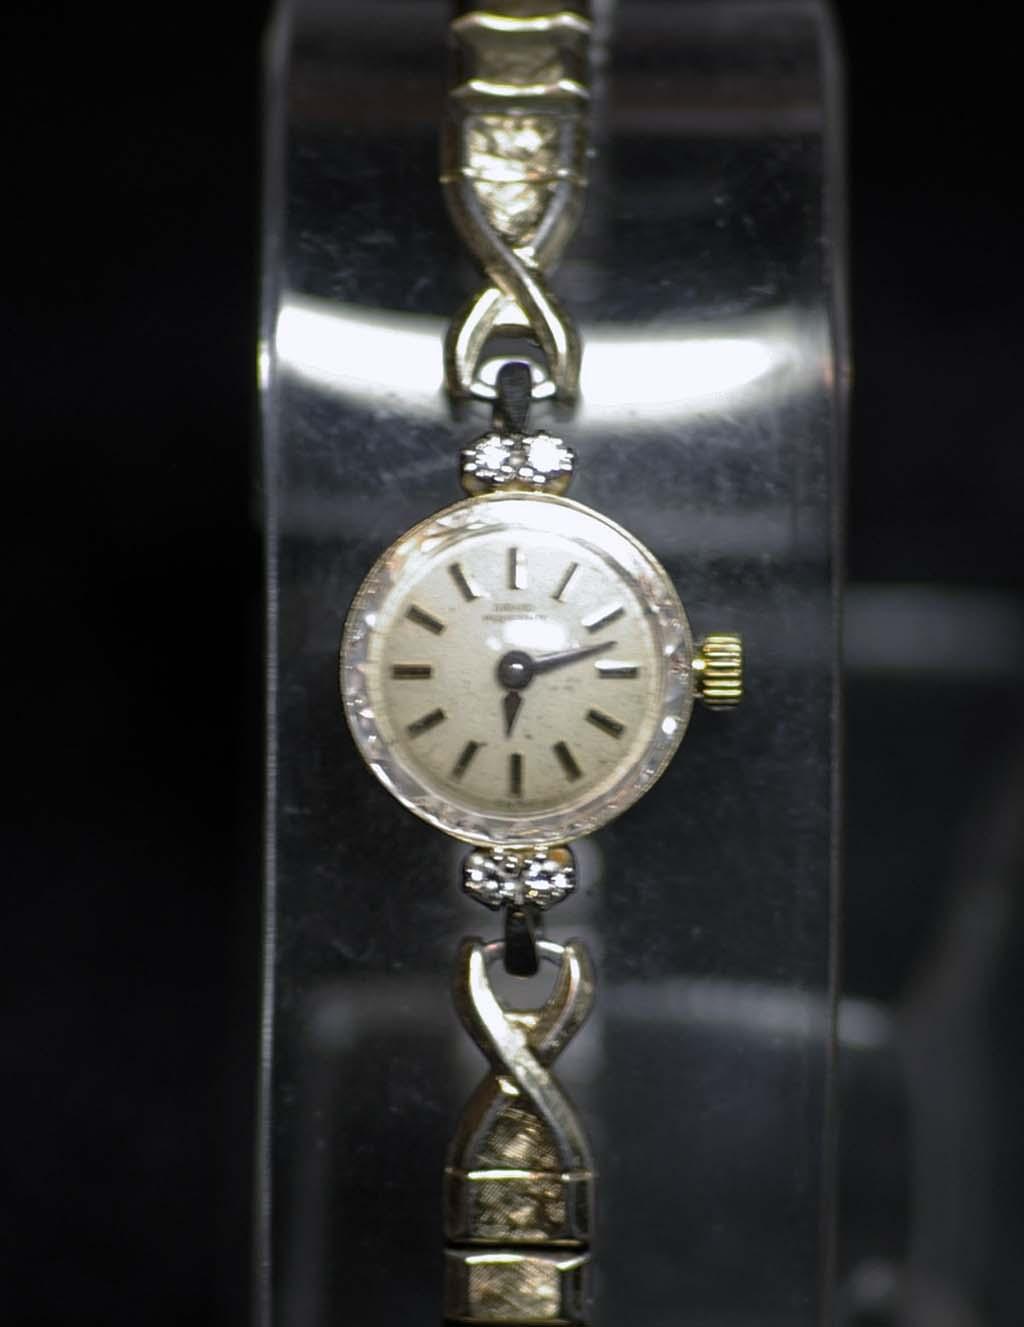 Vintage Girard Perregaux Ladies Watch